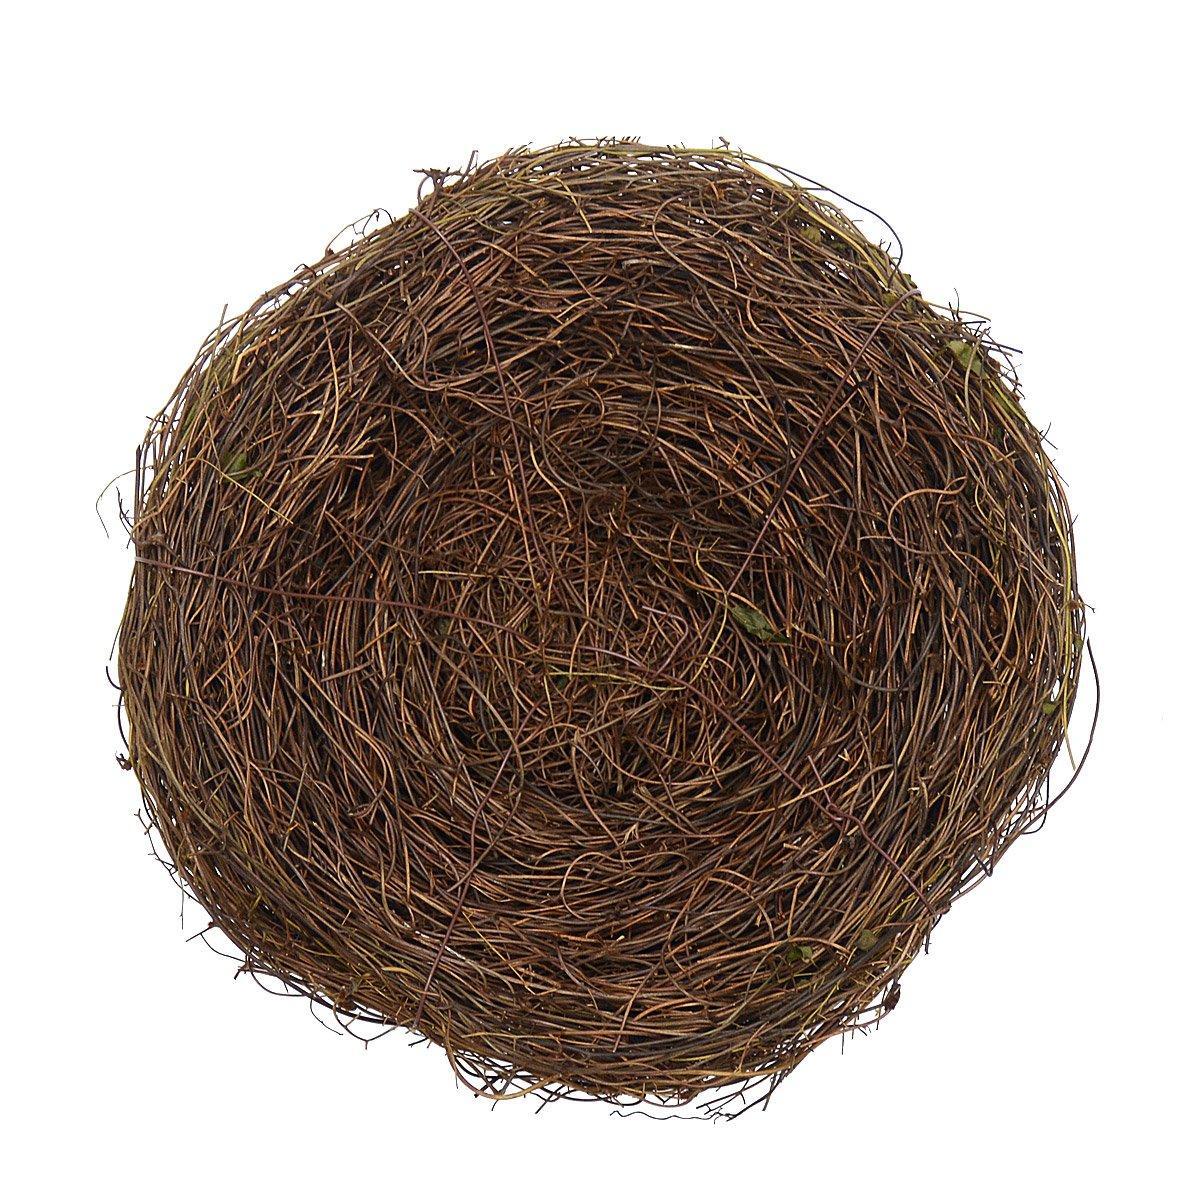 2Pcs 8'' Natural Rattan Birds Nest Spring Decoration Props Garden Yard Home